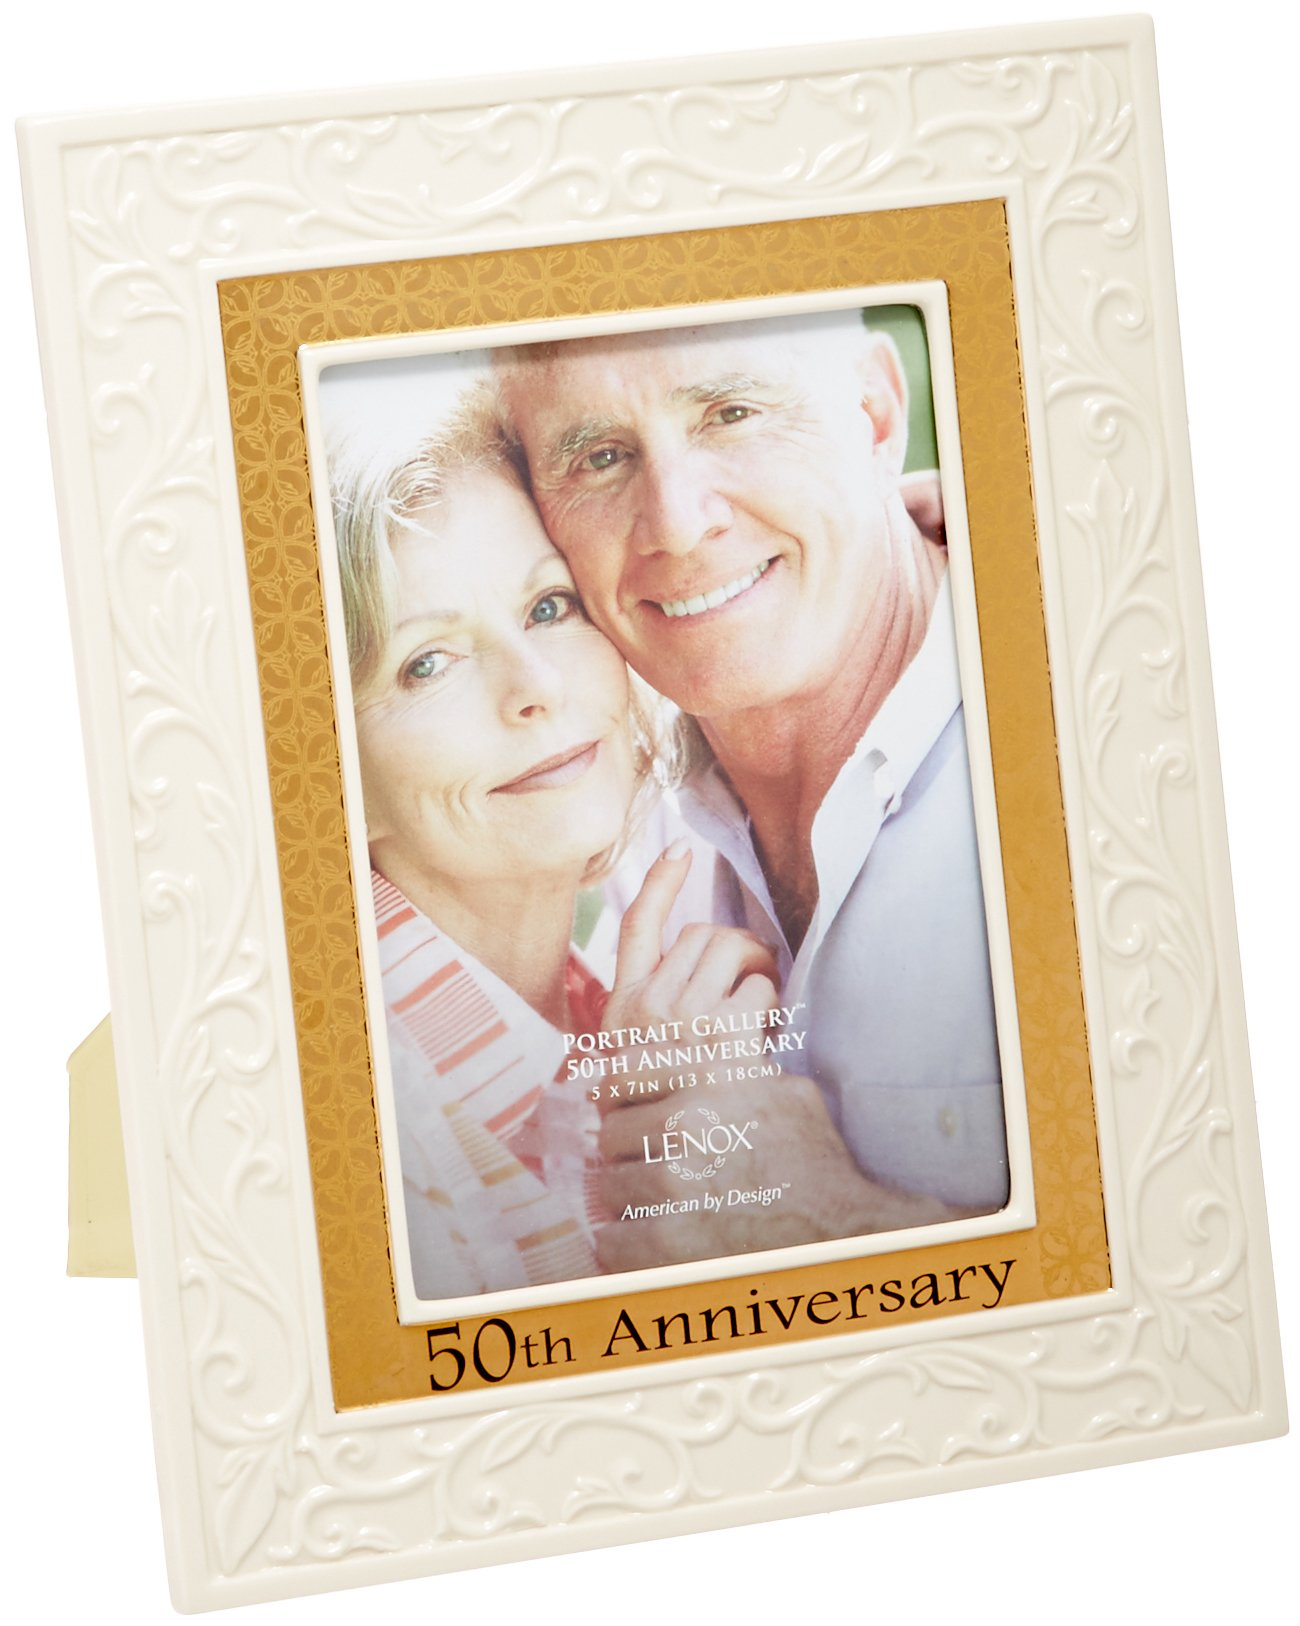 Lenox Portrait Gallery 50th Anniversary Luxury Frame, 5 by 7-Inch by Lenox